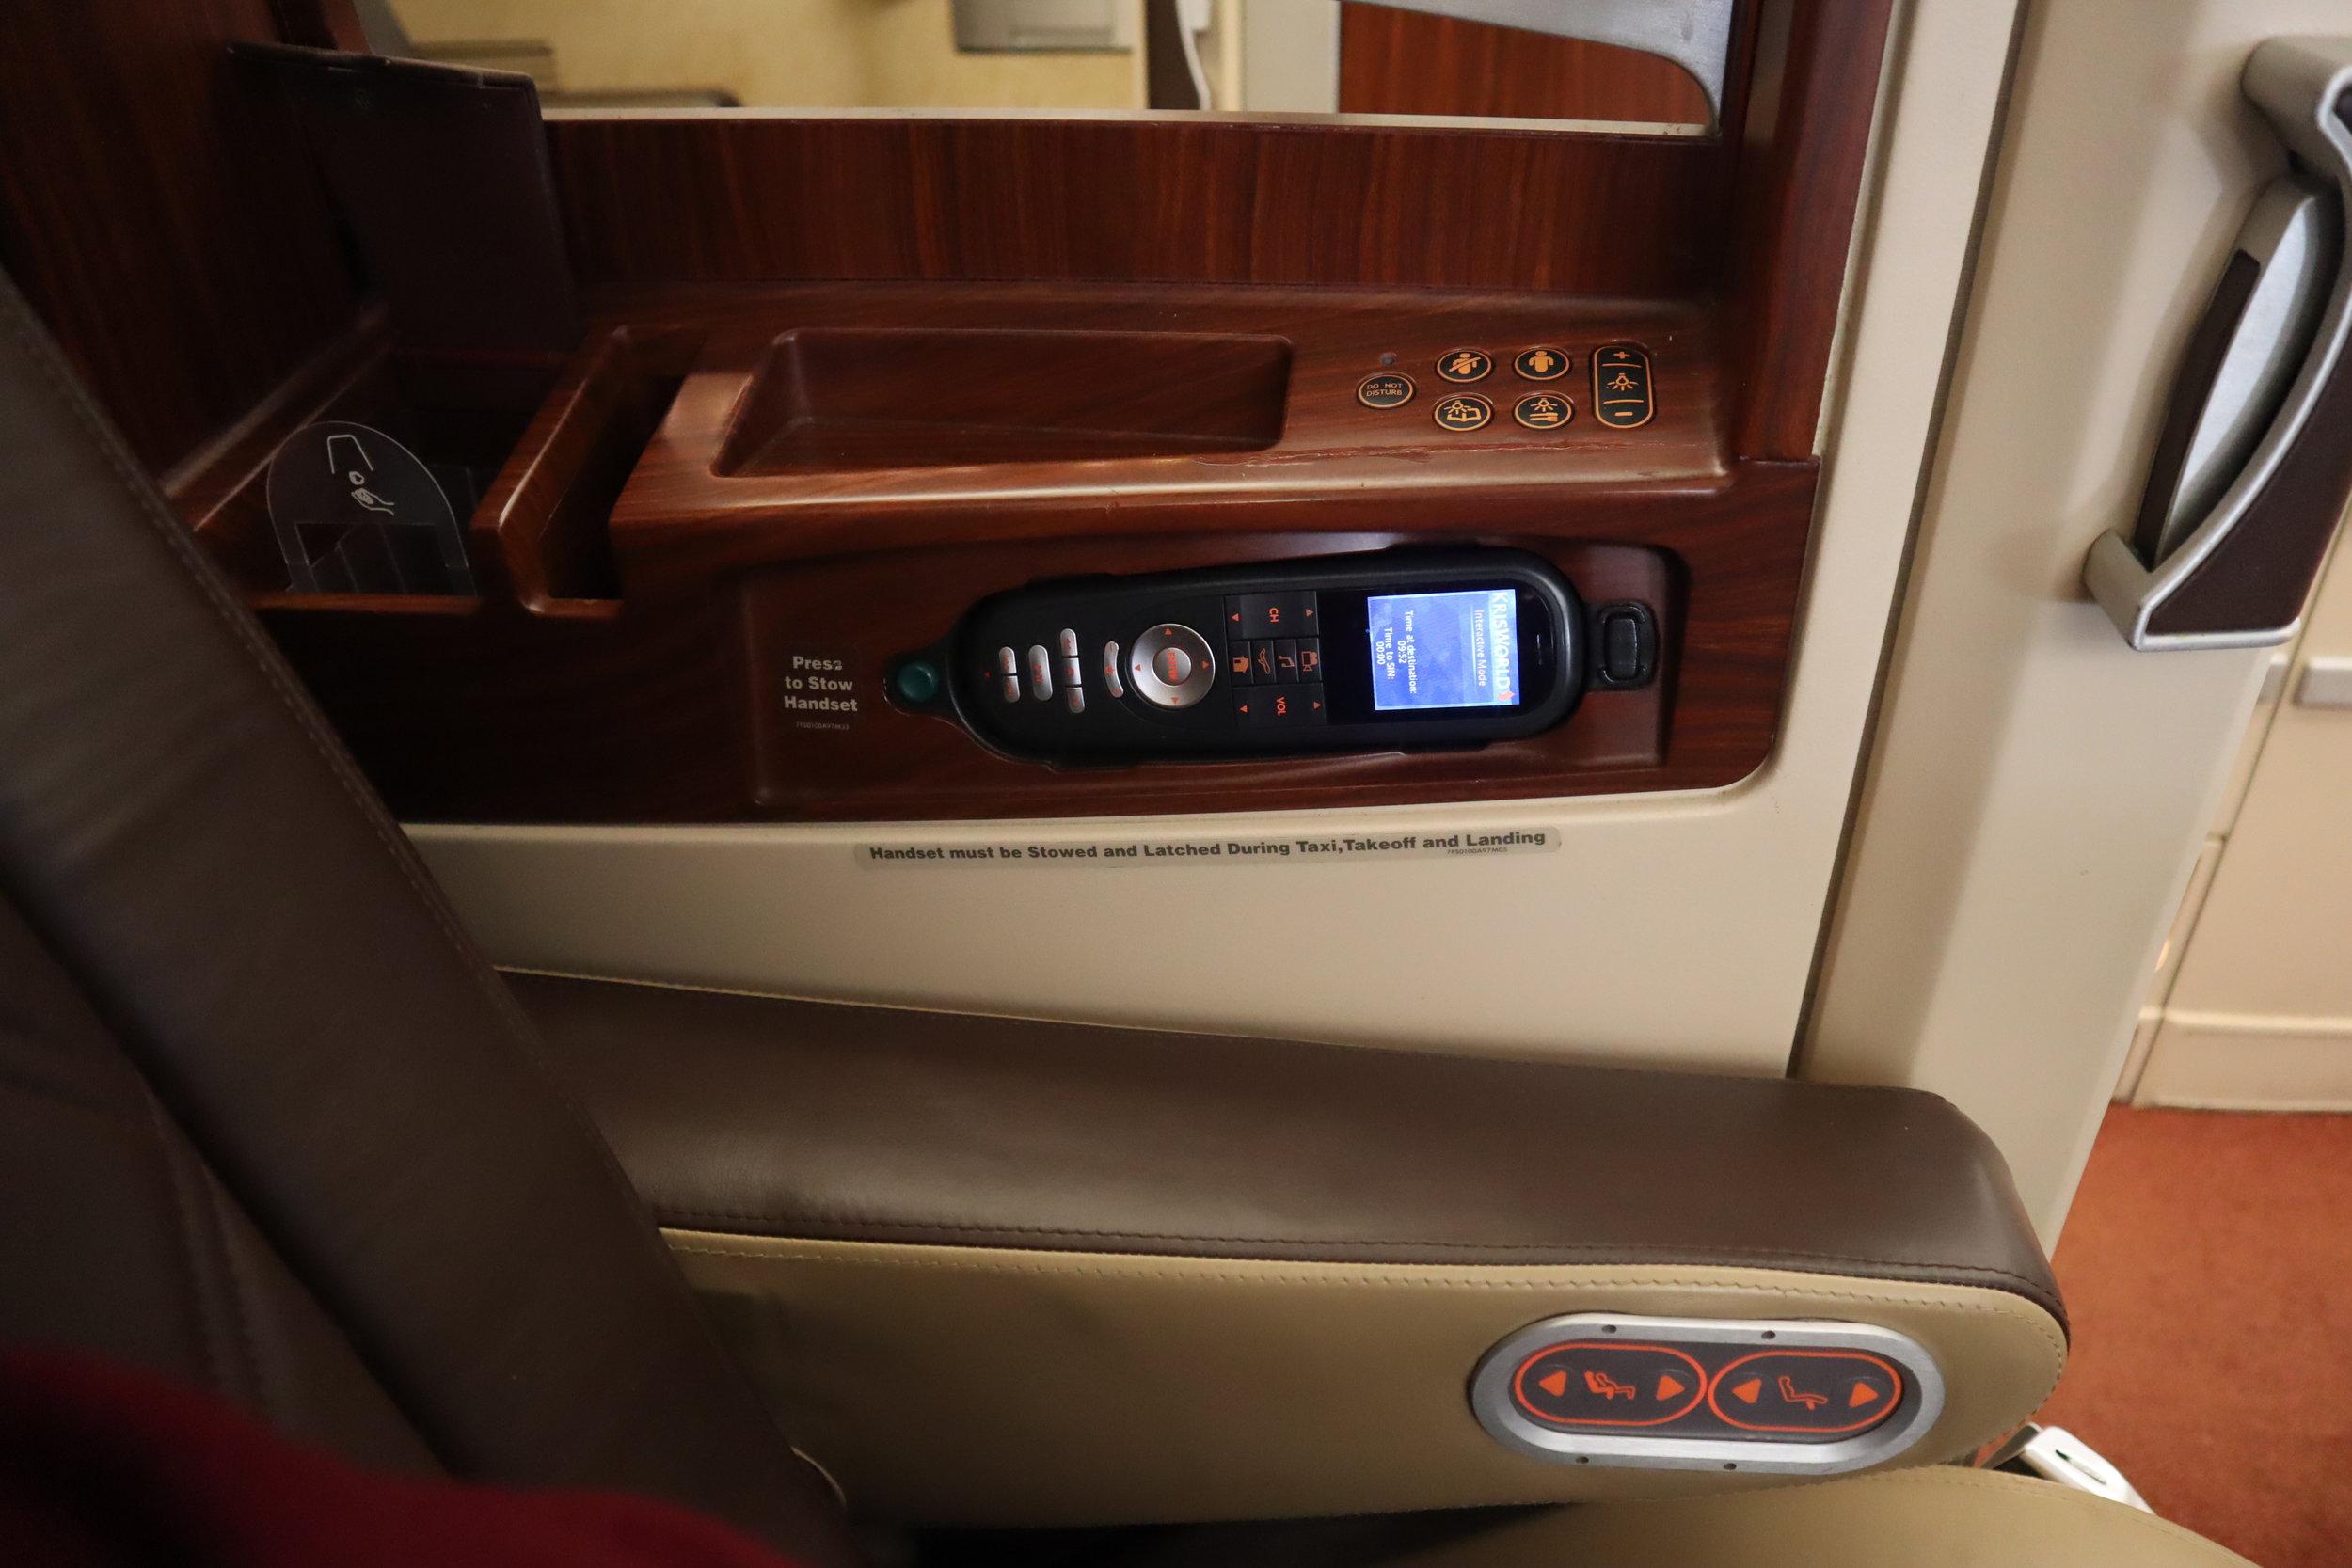 Singapore Airlines Suites Class – Control panel